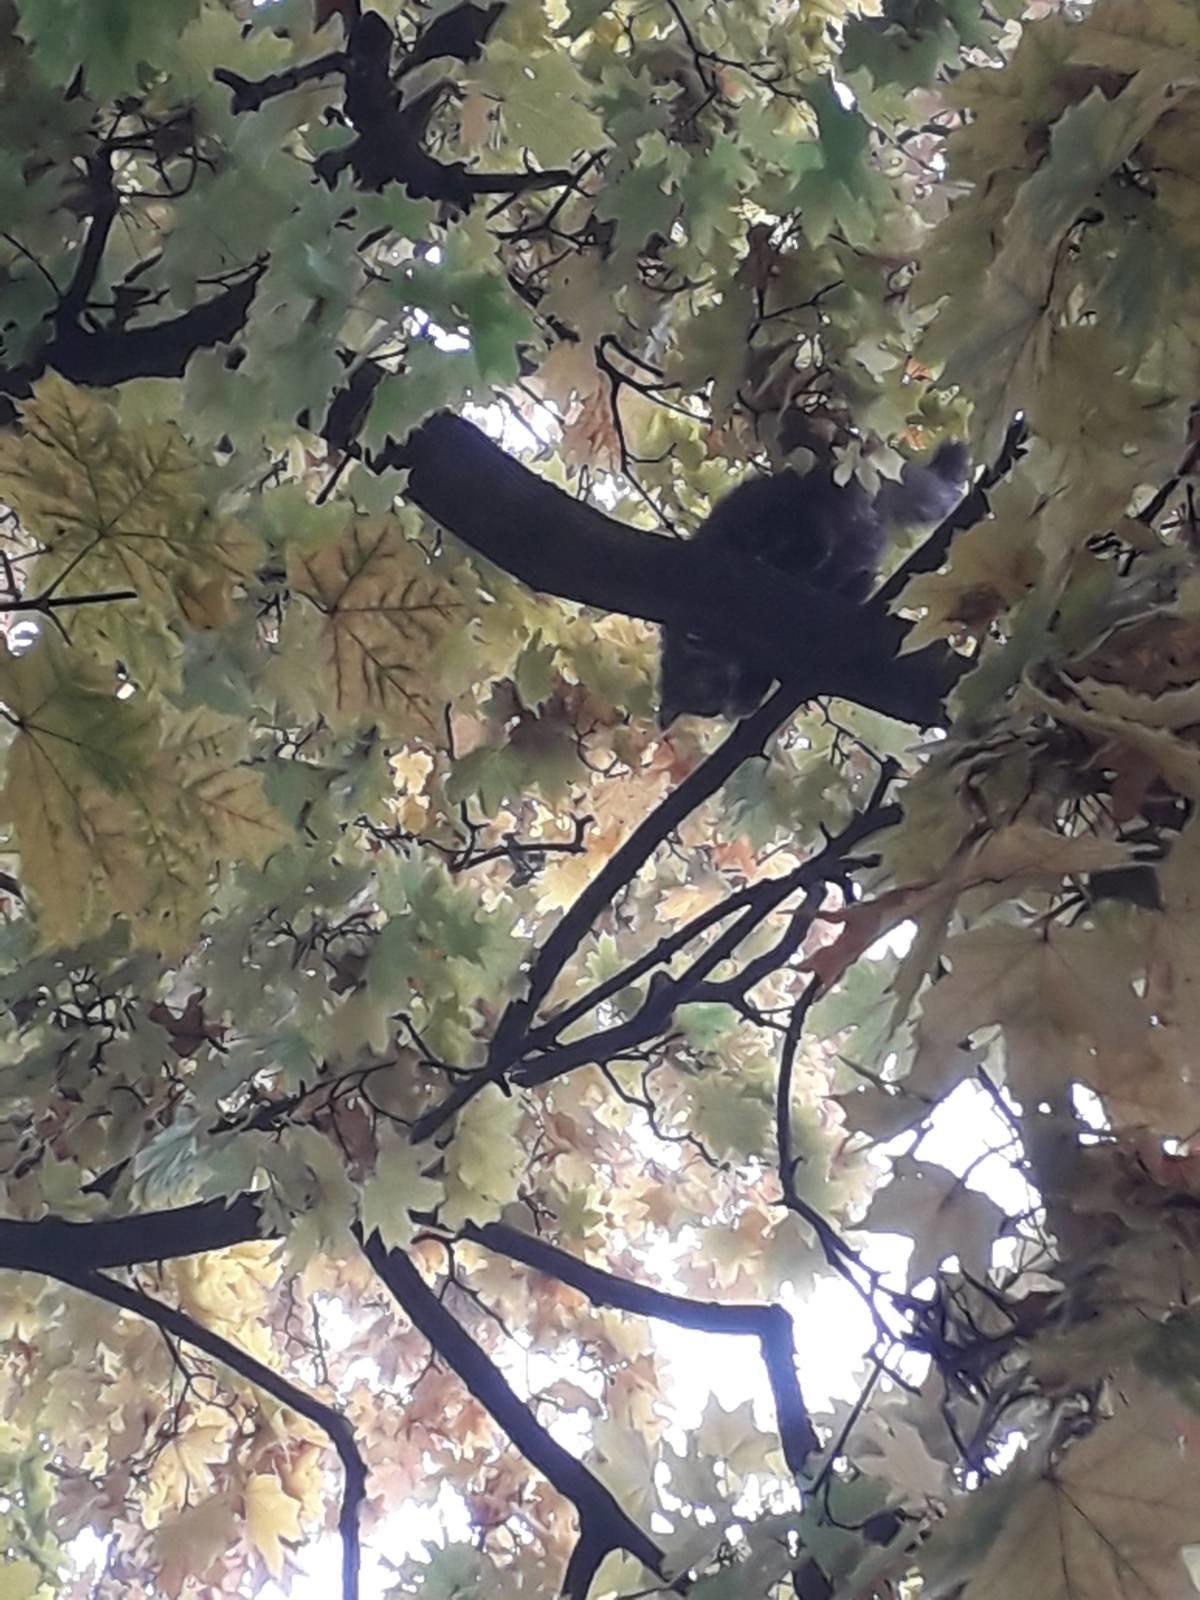 В Днепре пятеро пожарных спасали котика, - ФОТО, фото-4